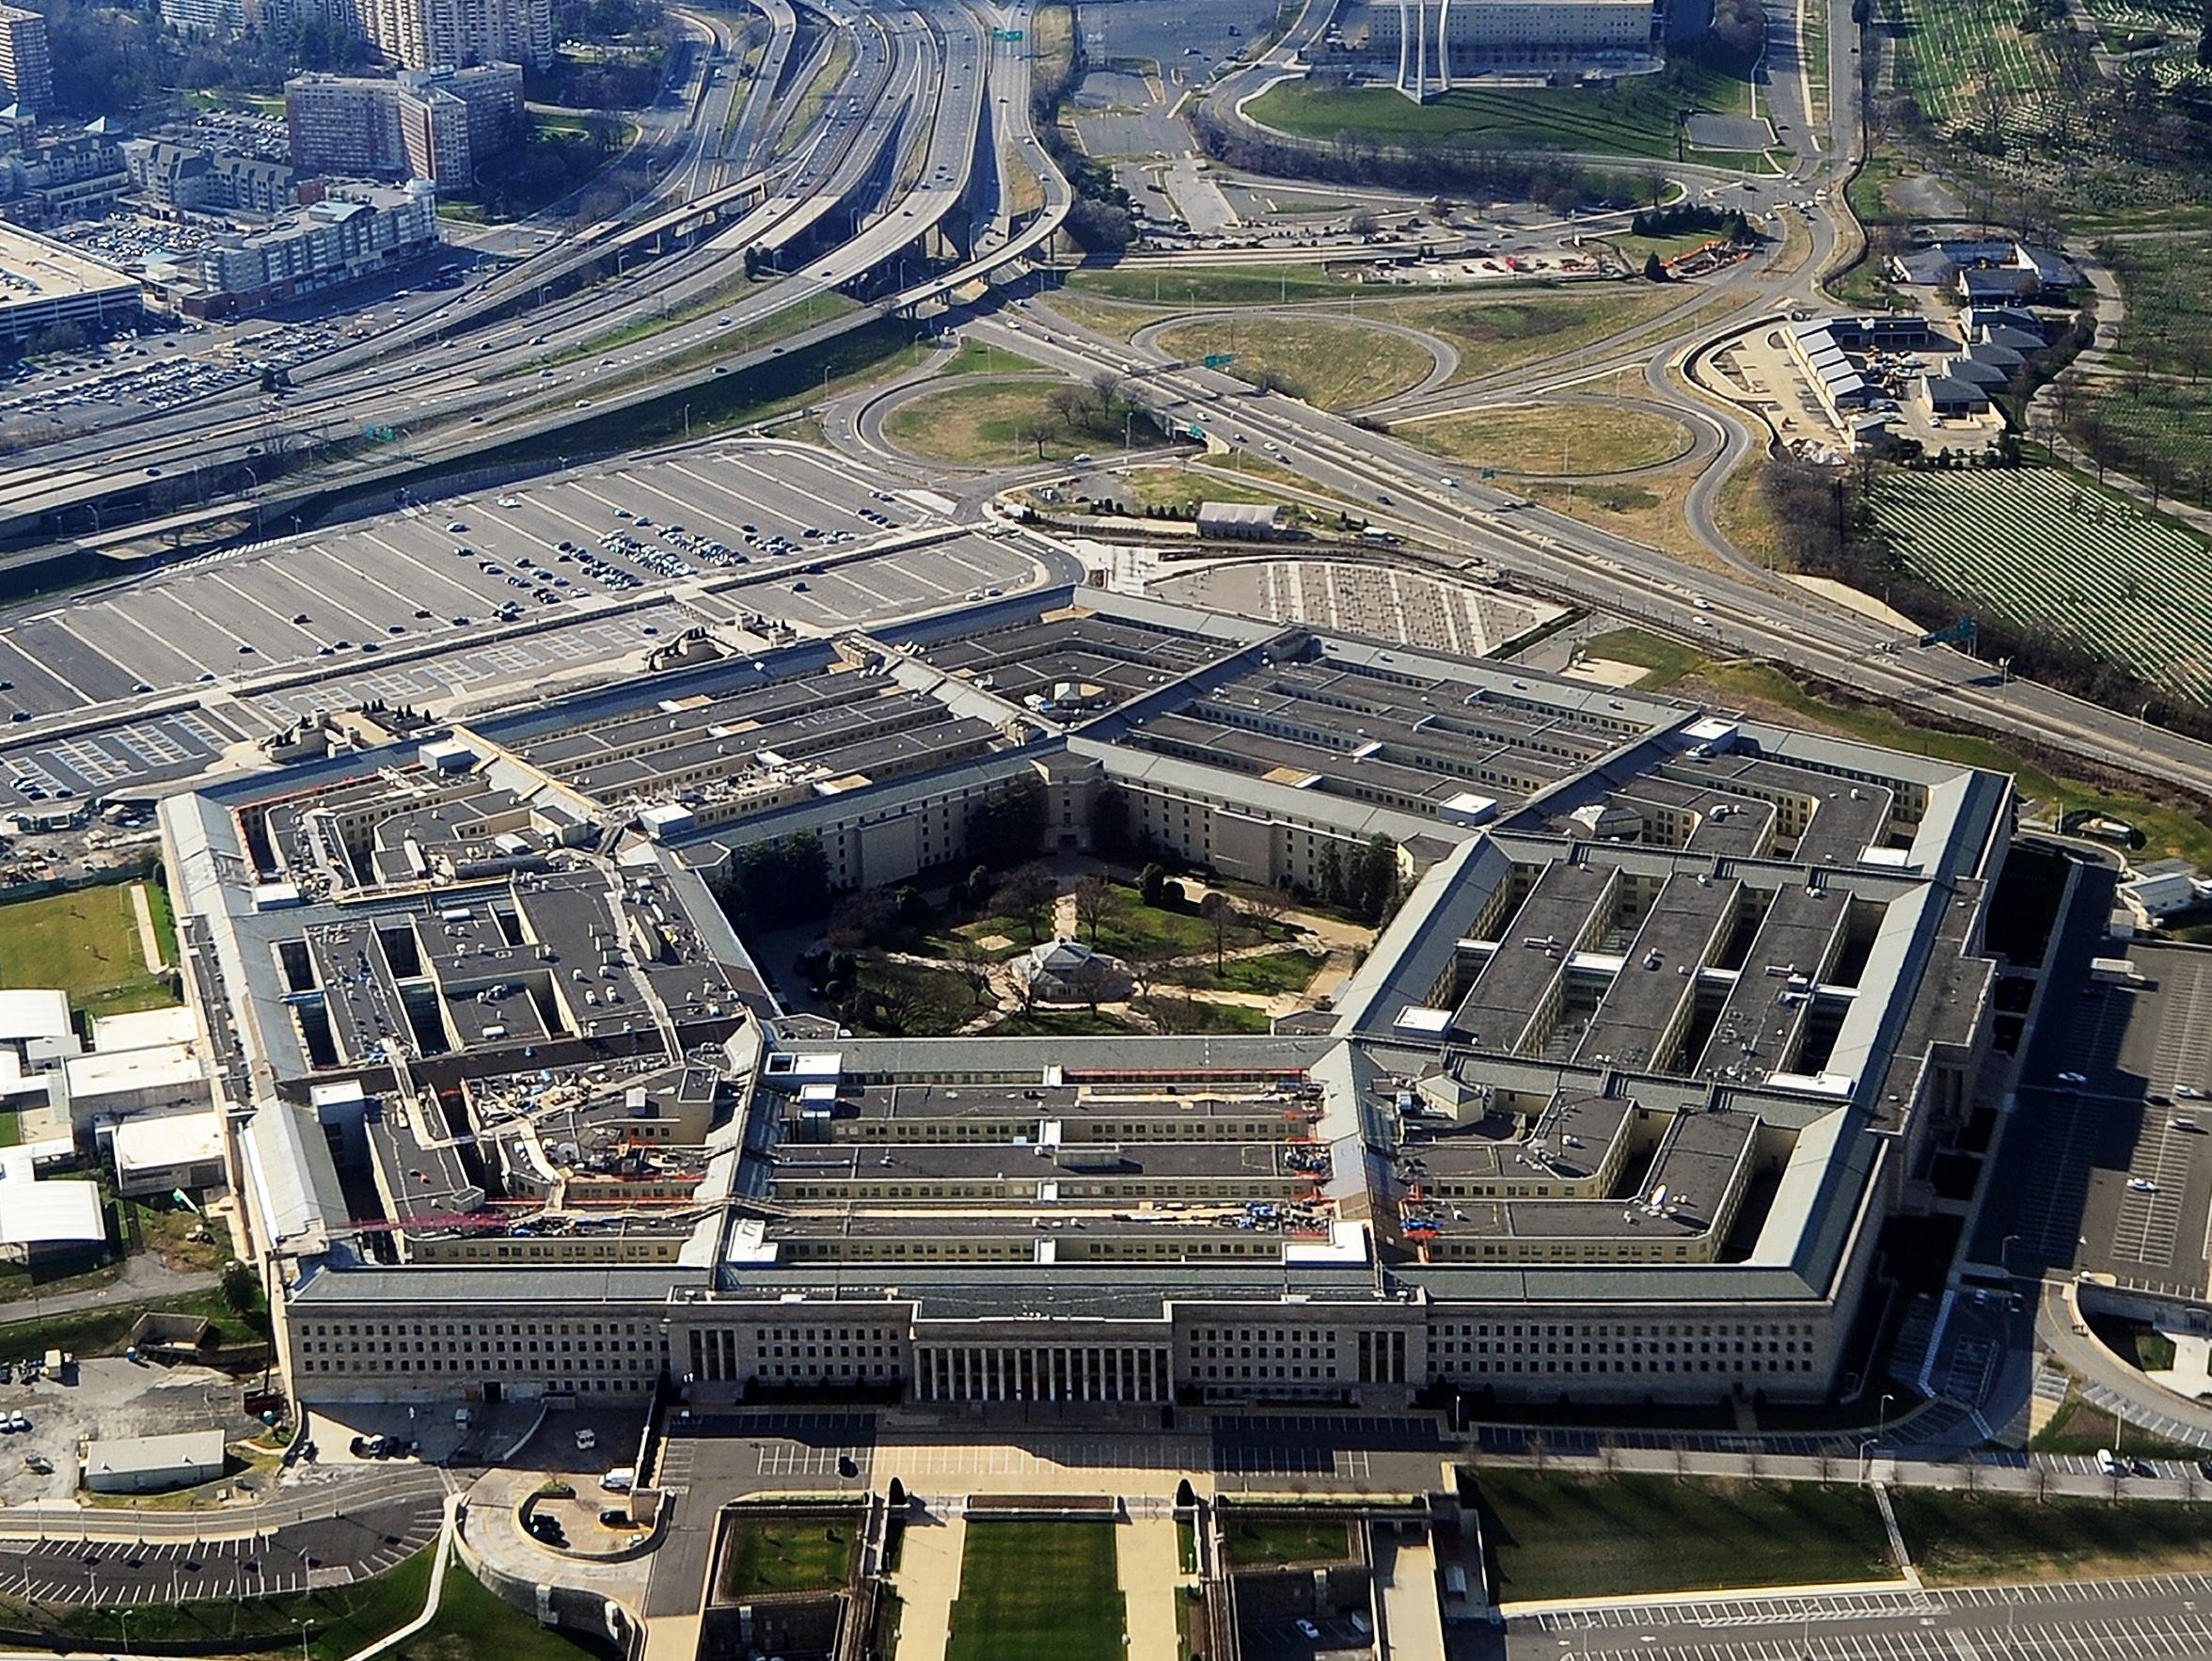 Pentagon Details Plan To Extend Benefits To Same-Sex Spouses